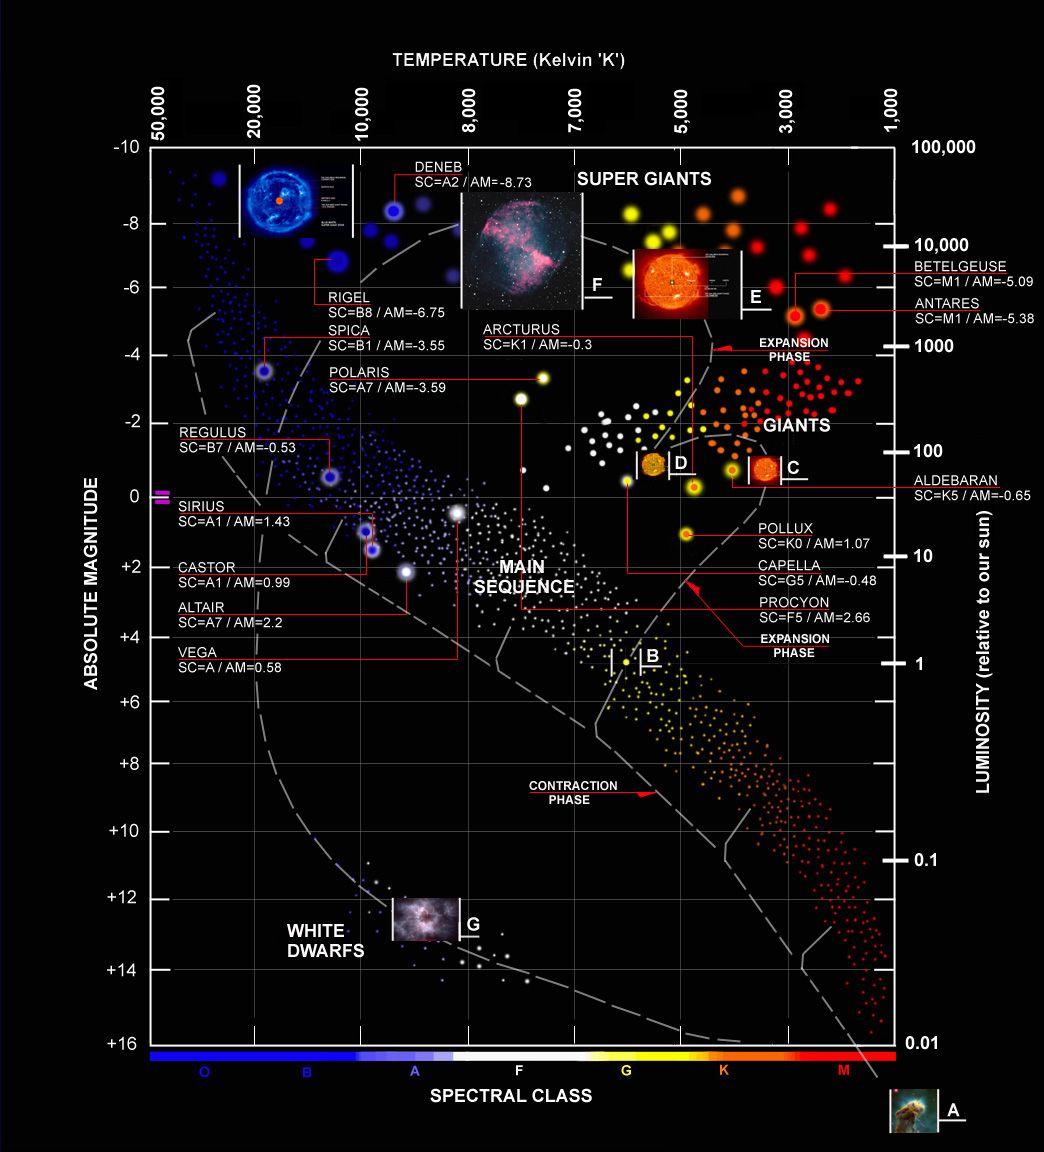 hertzsprung russell diagram cycle of stars  [ 1044 x 1152 Pixel ]